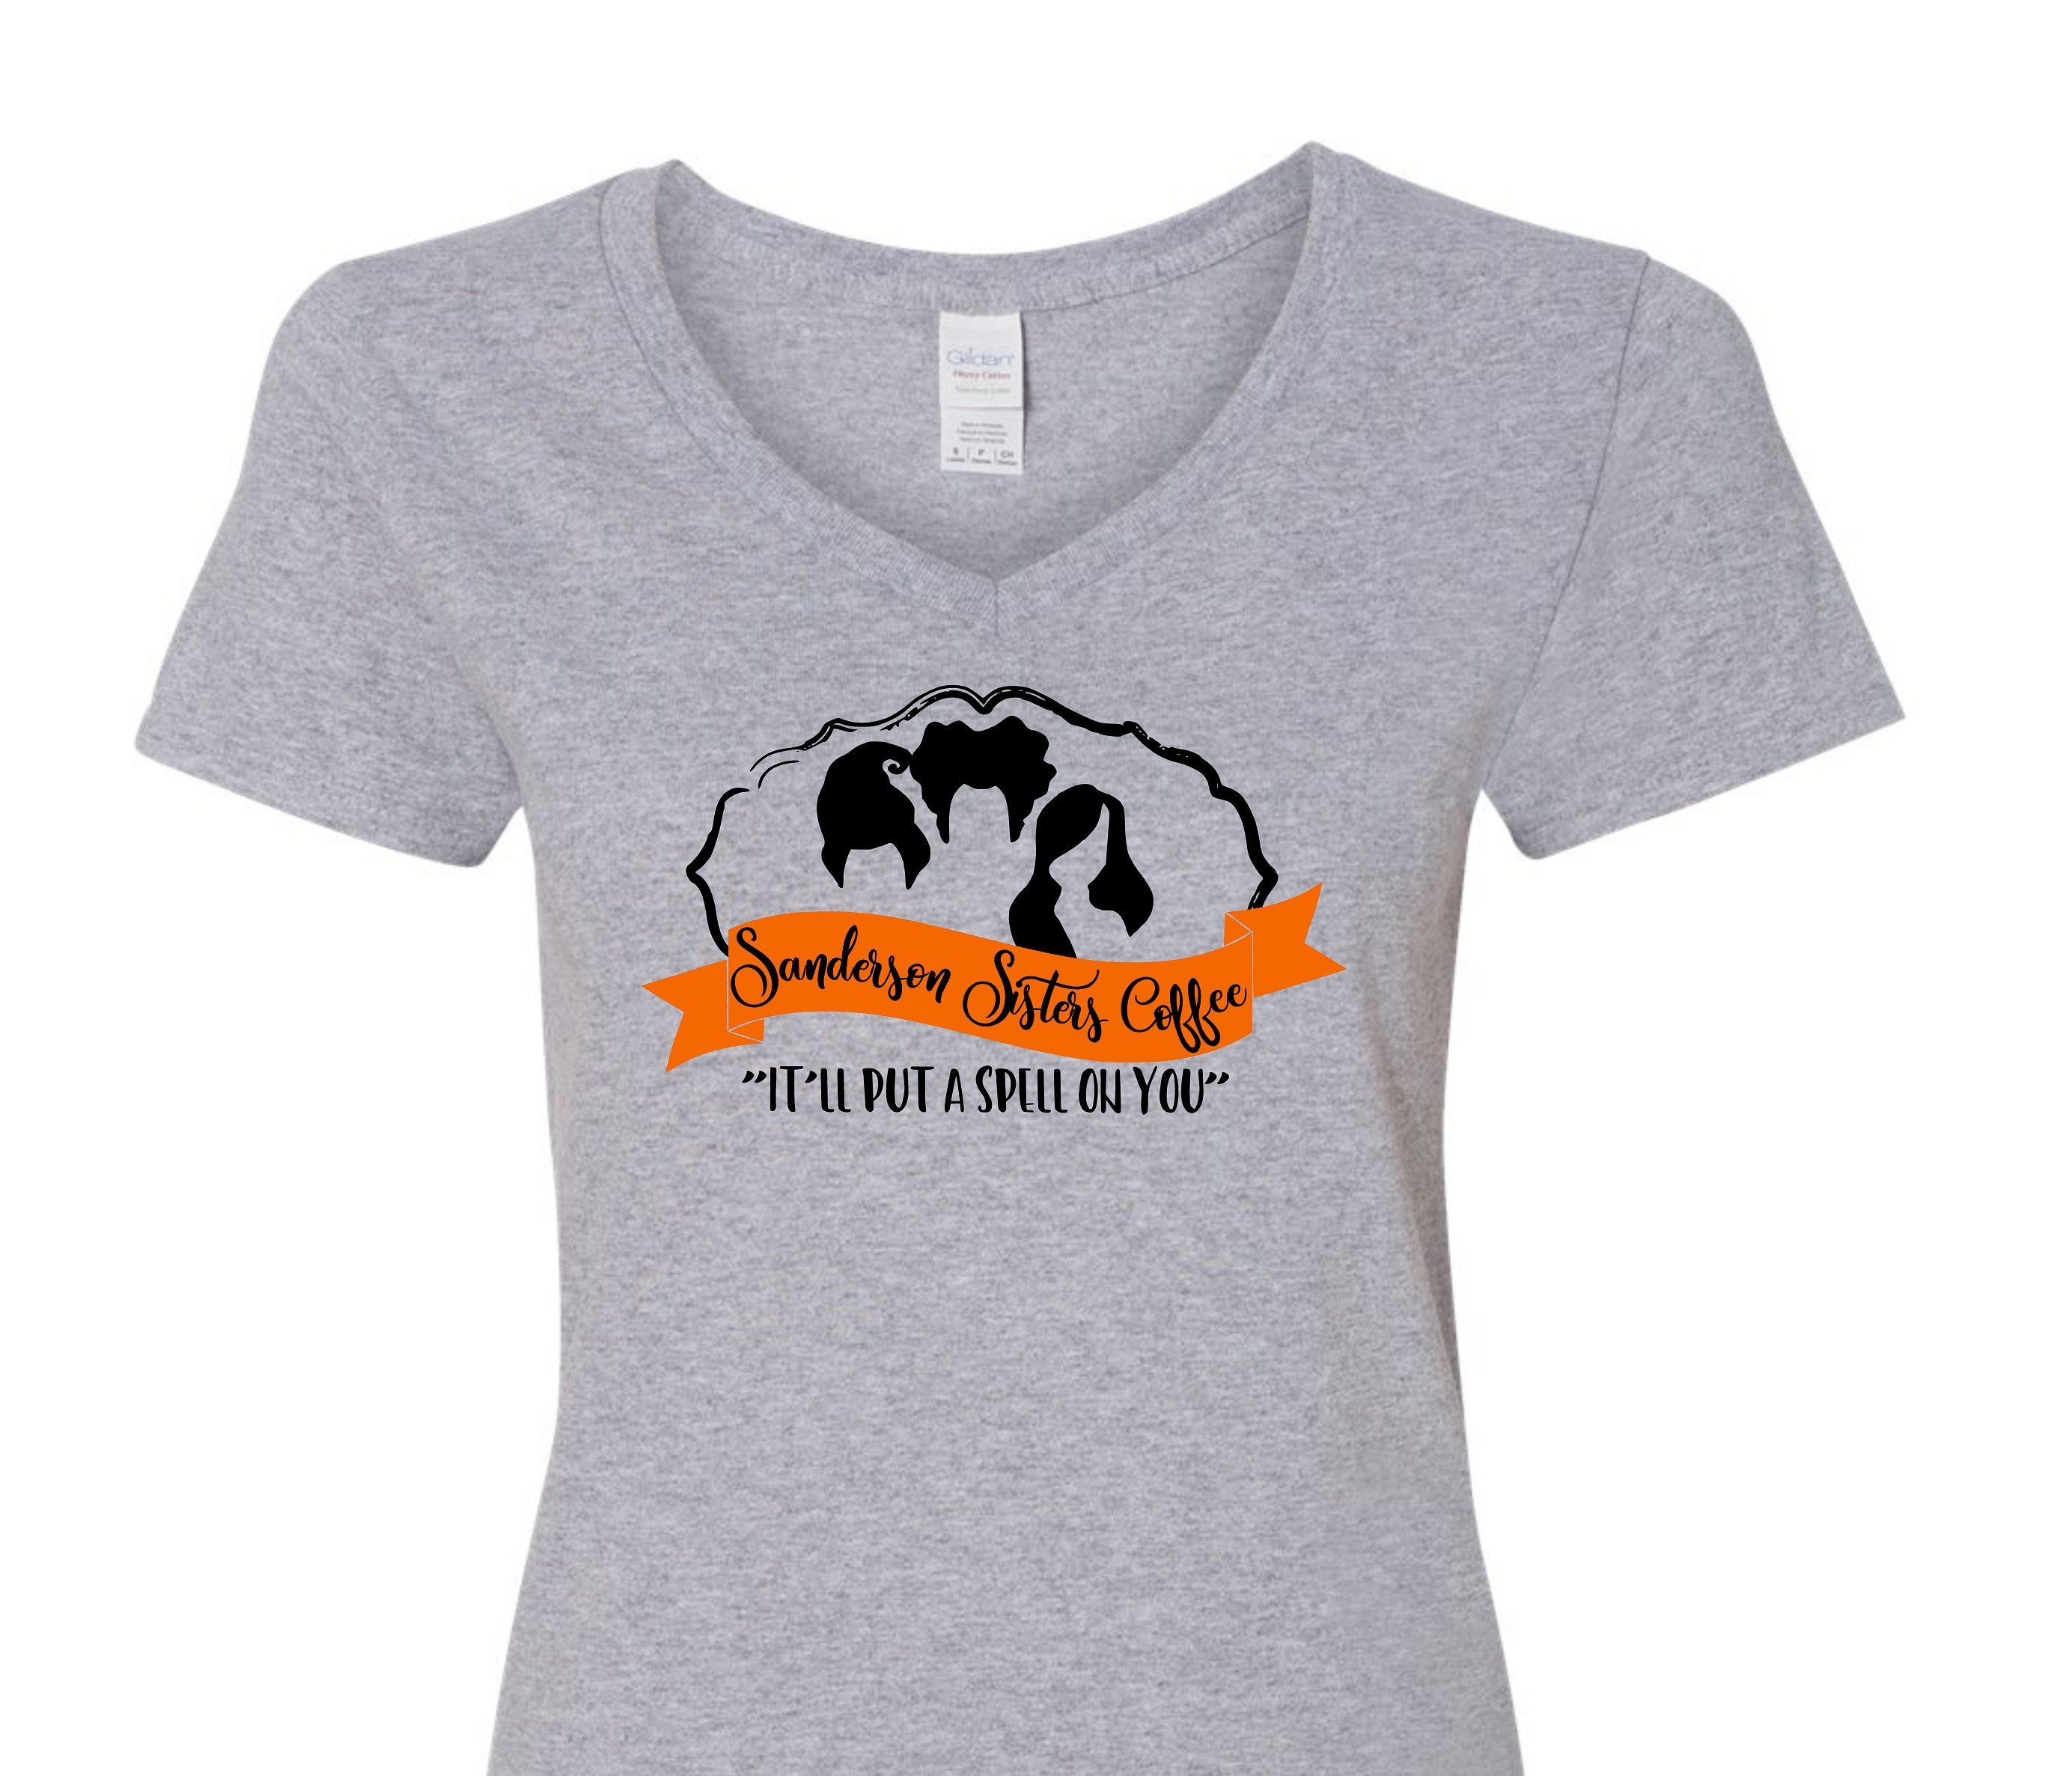 "Funny Halloween or Fall shirt - ""Sanderson Sisters Coffee ..."